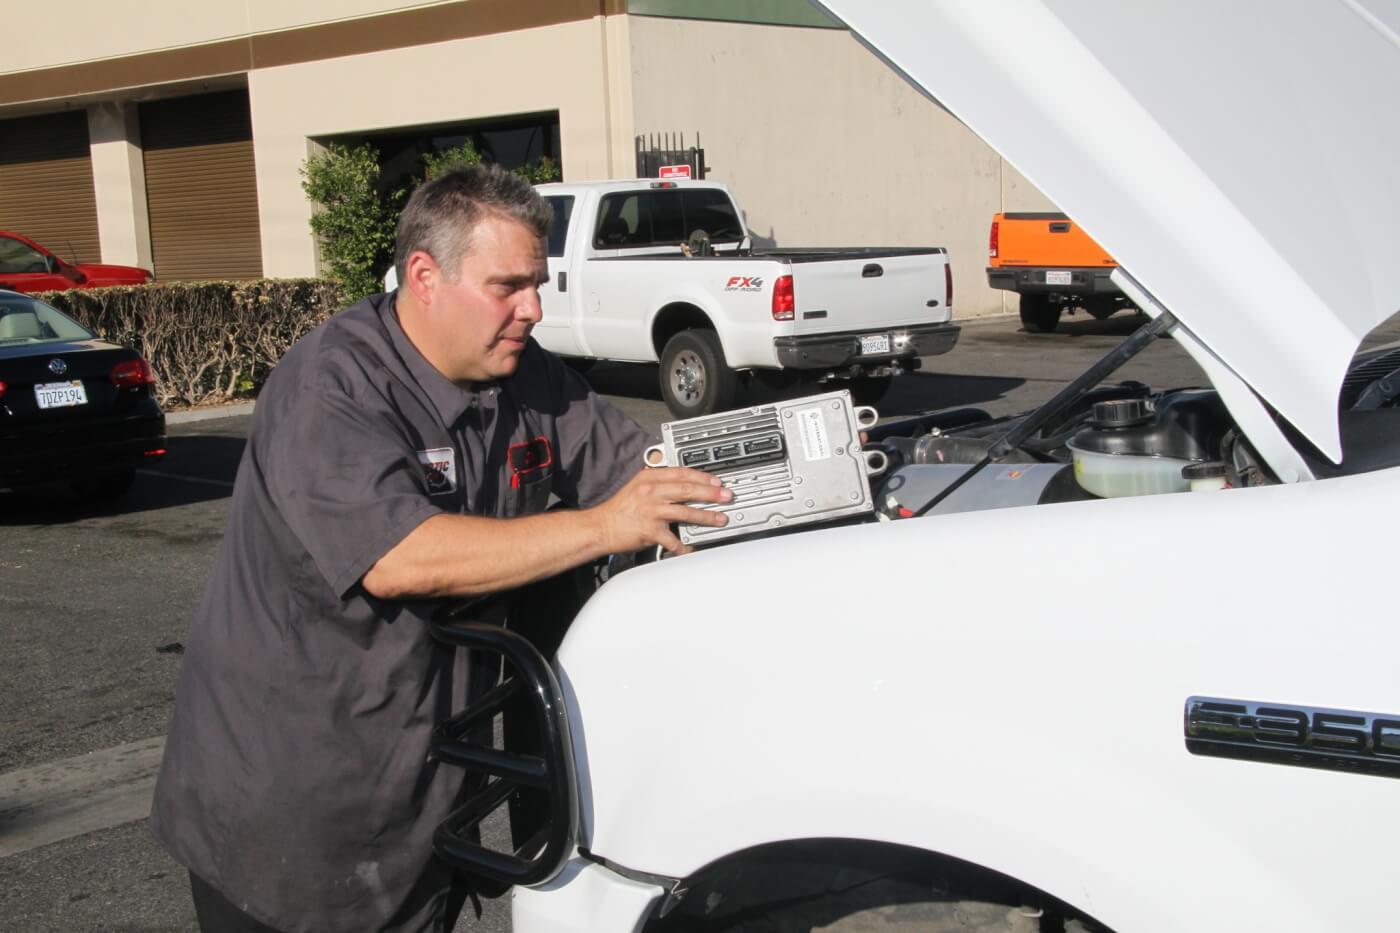 Fuel Injection Control Module FICM Board for 04-10 FORD F-250 F-350 6.0L Diesel